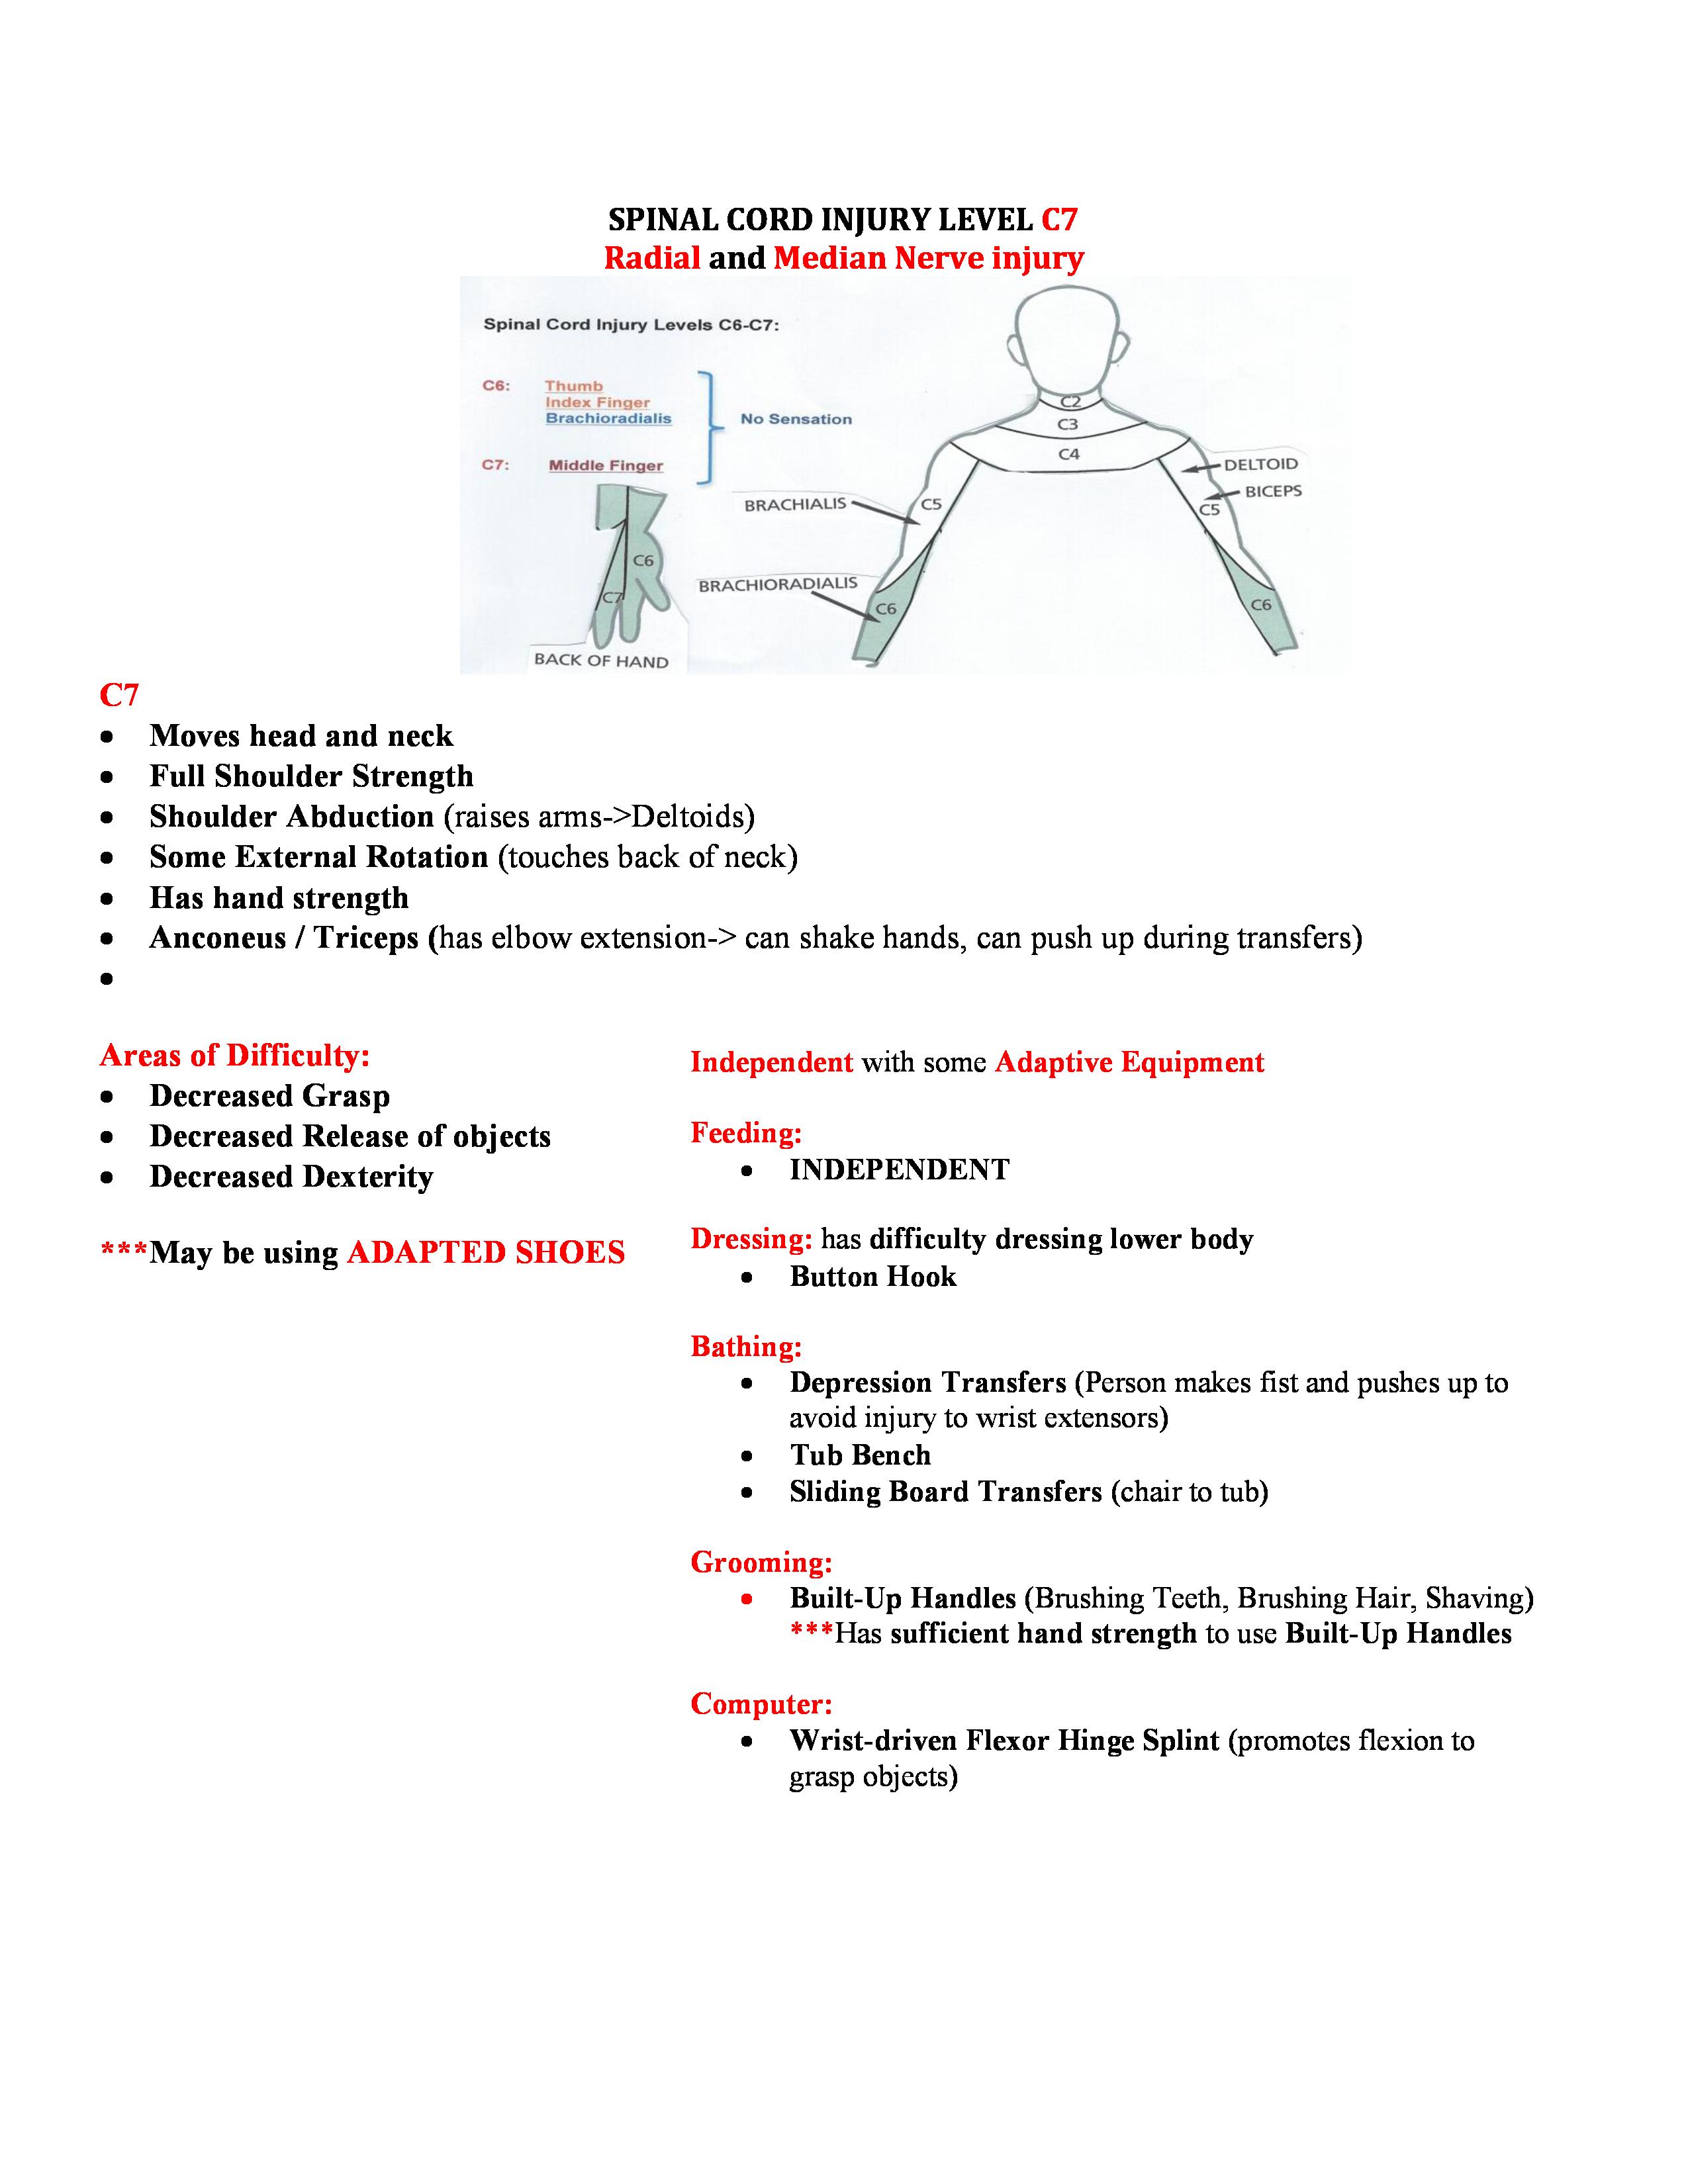 Spinal Cord Injuries C7